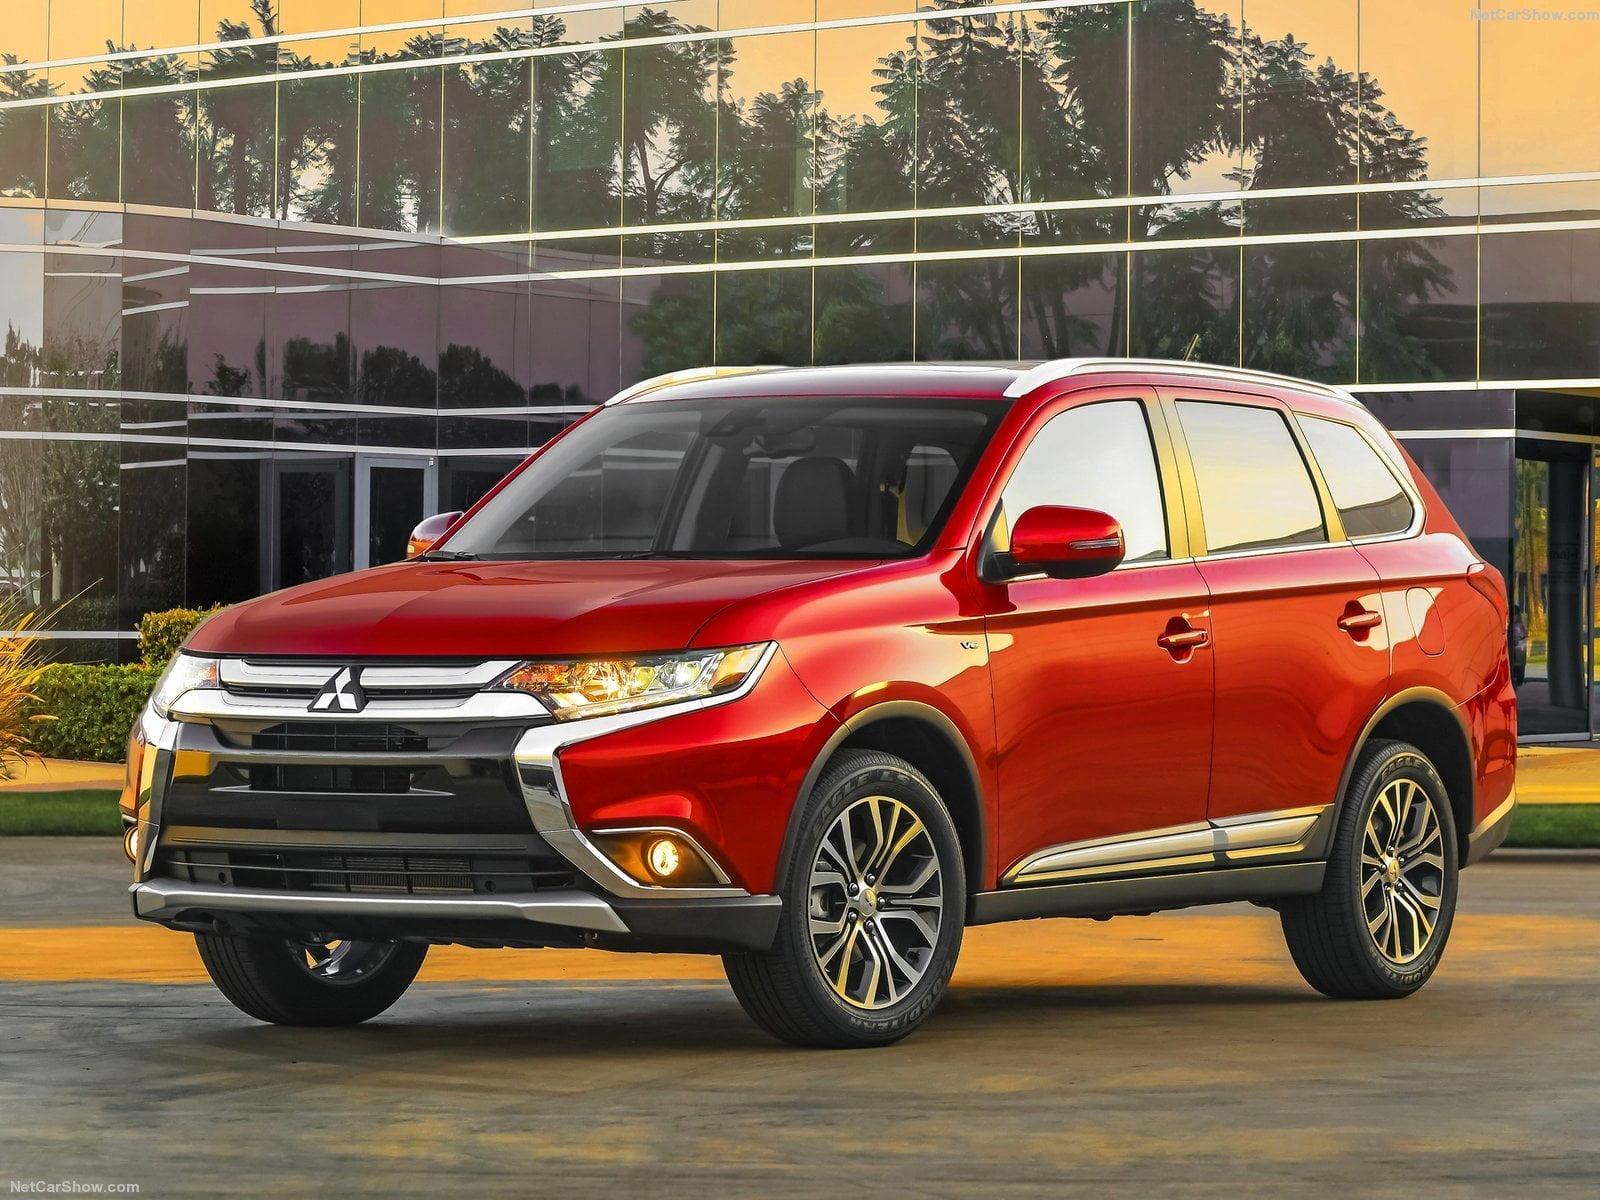 Japan domestic vehicles market